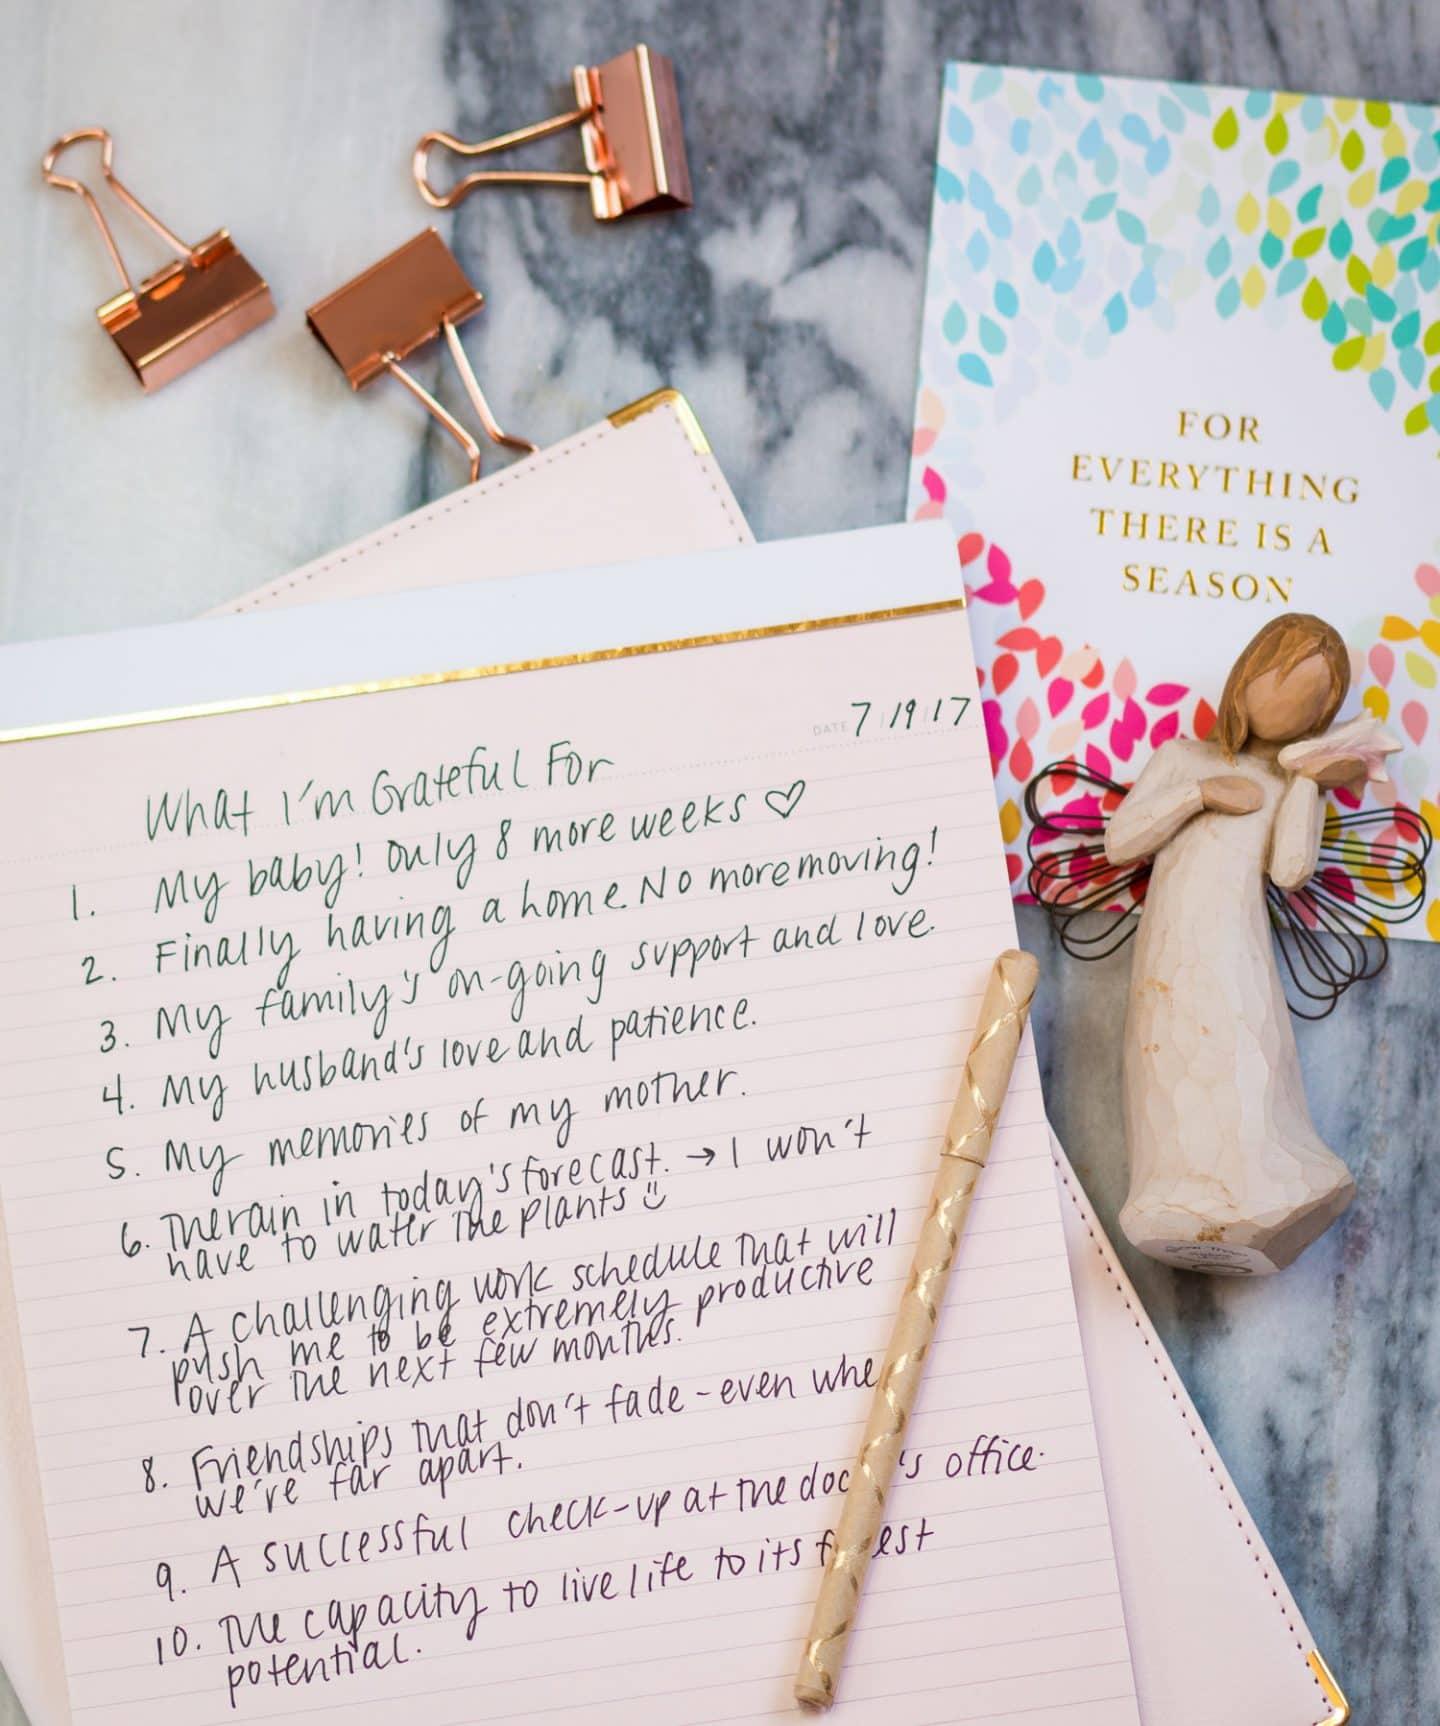 good day inspiration tips ashley brooke nicholas gratitude journal better day tips